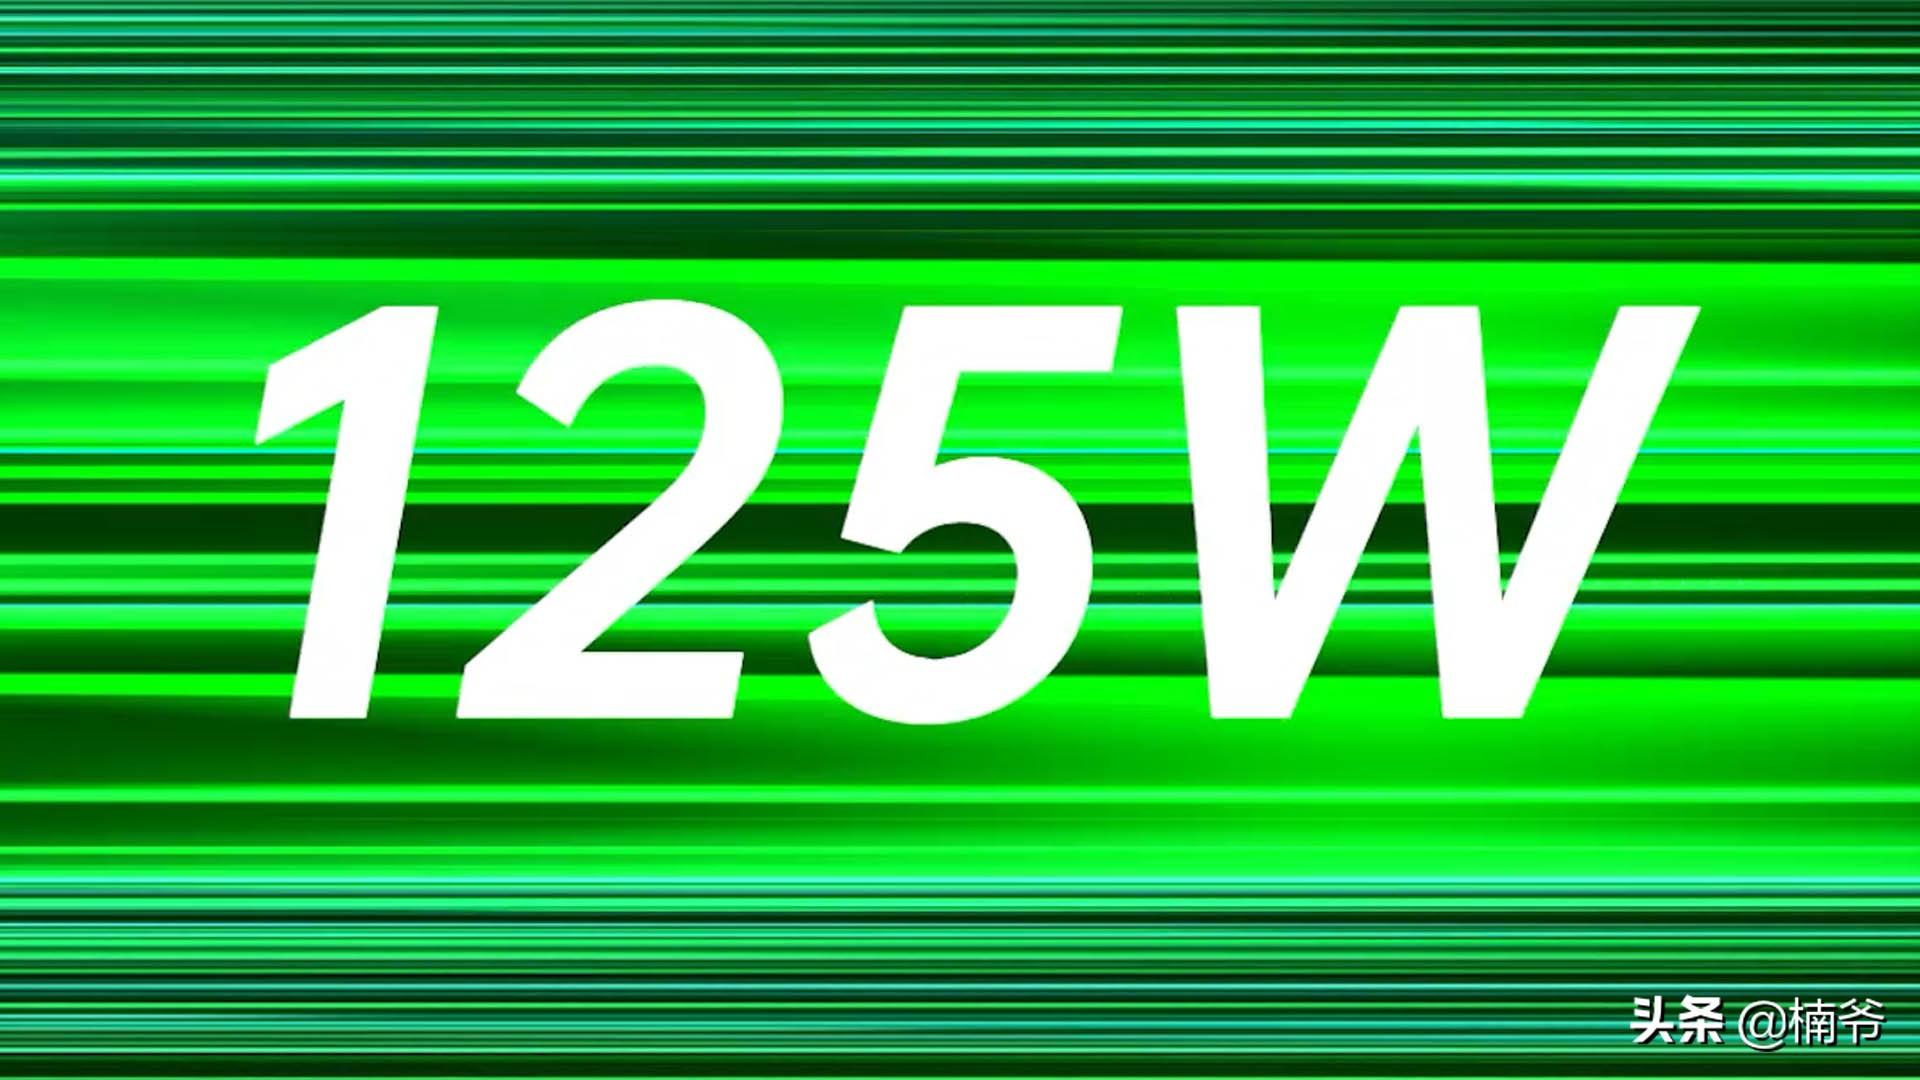 125W闪充问世,OPPO统一线下充电江湖的野望